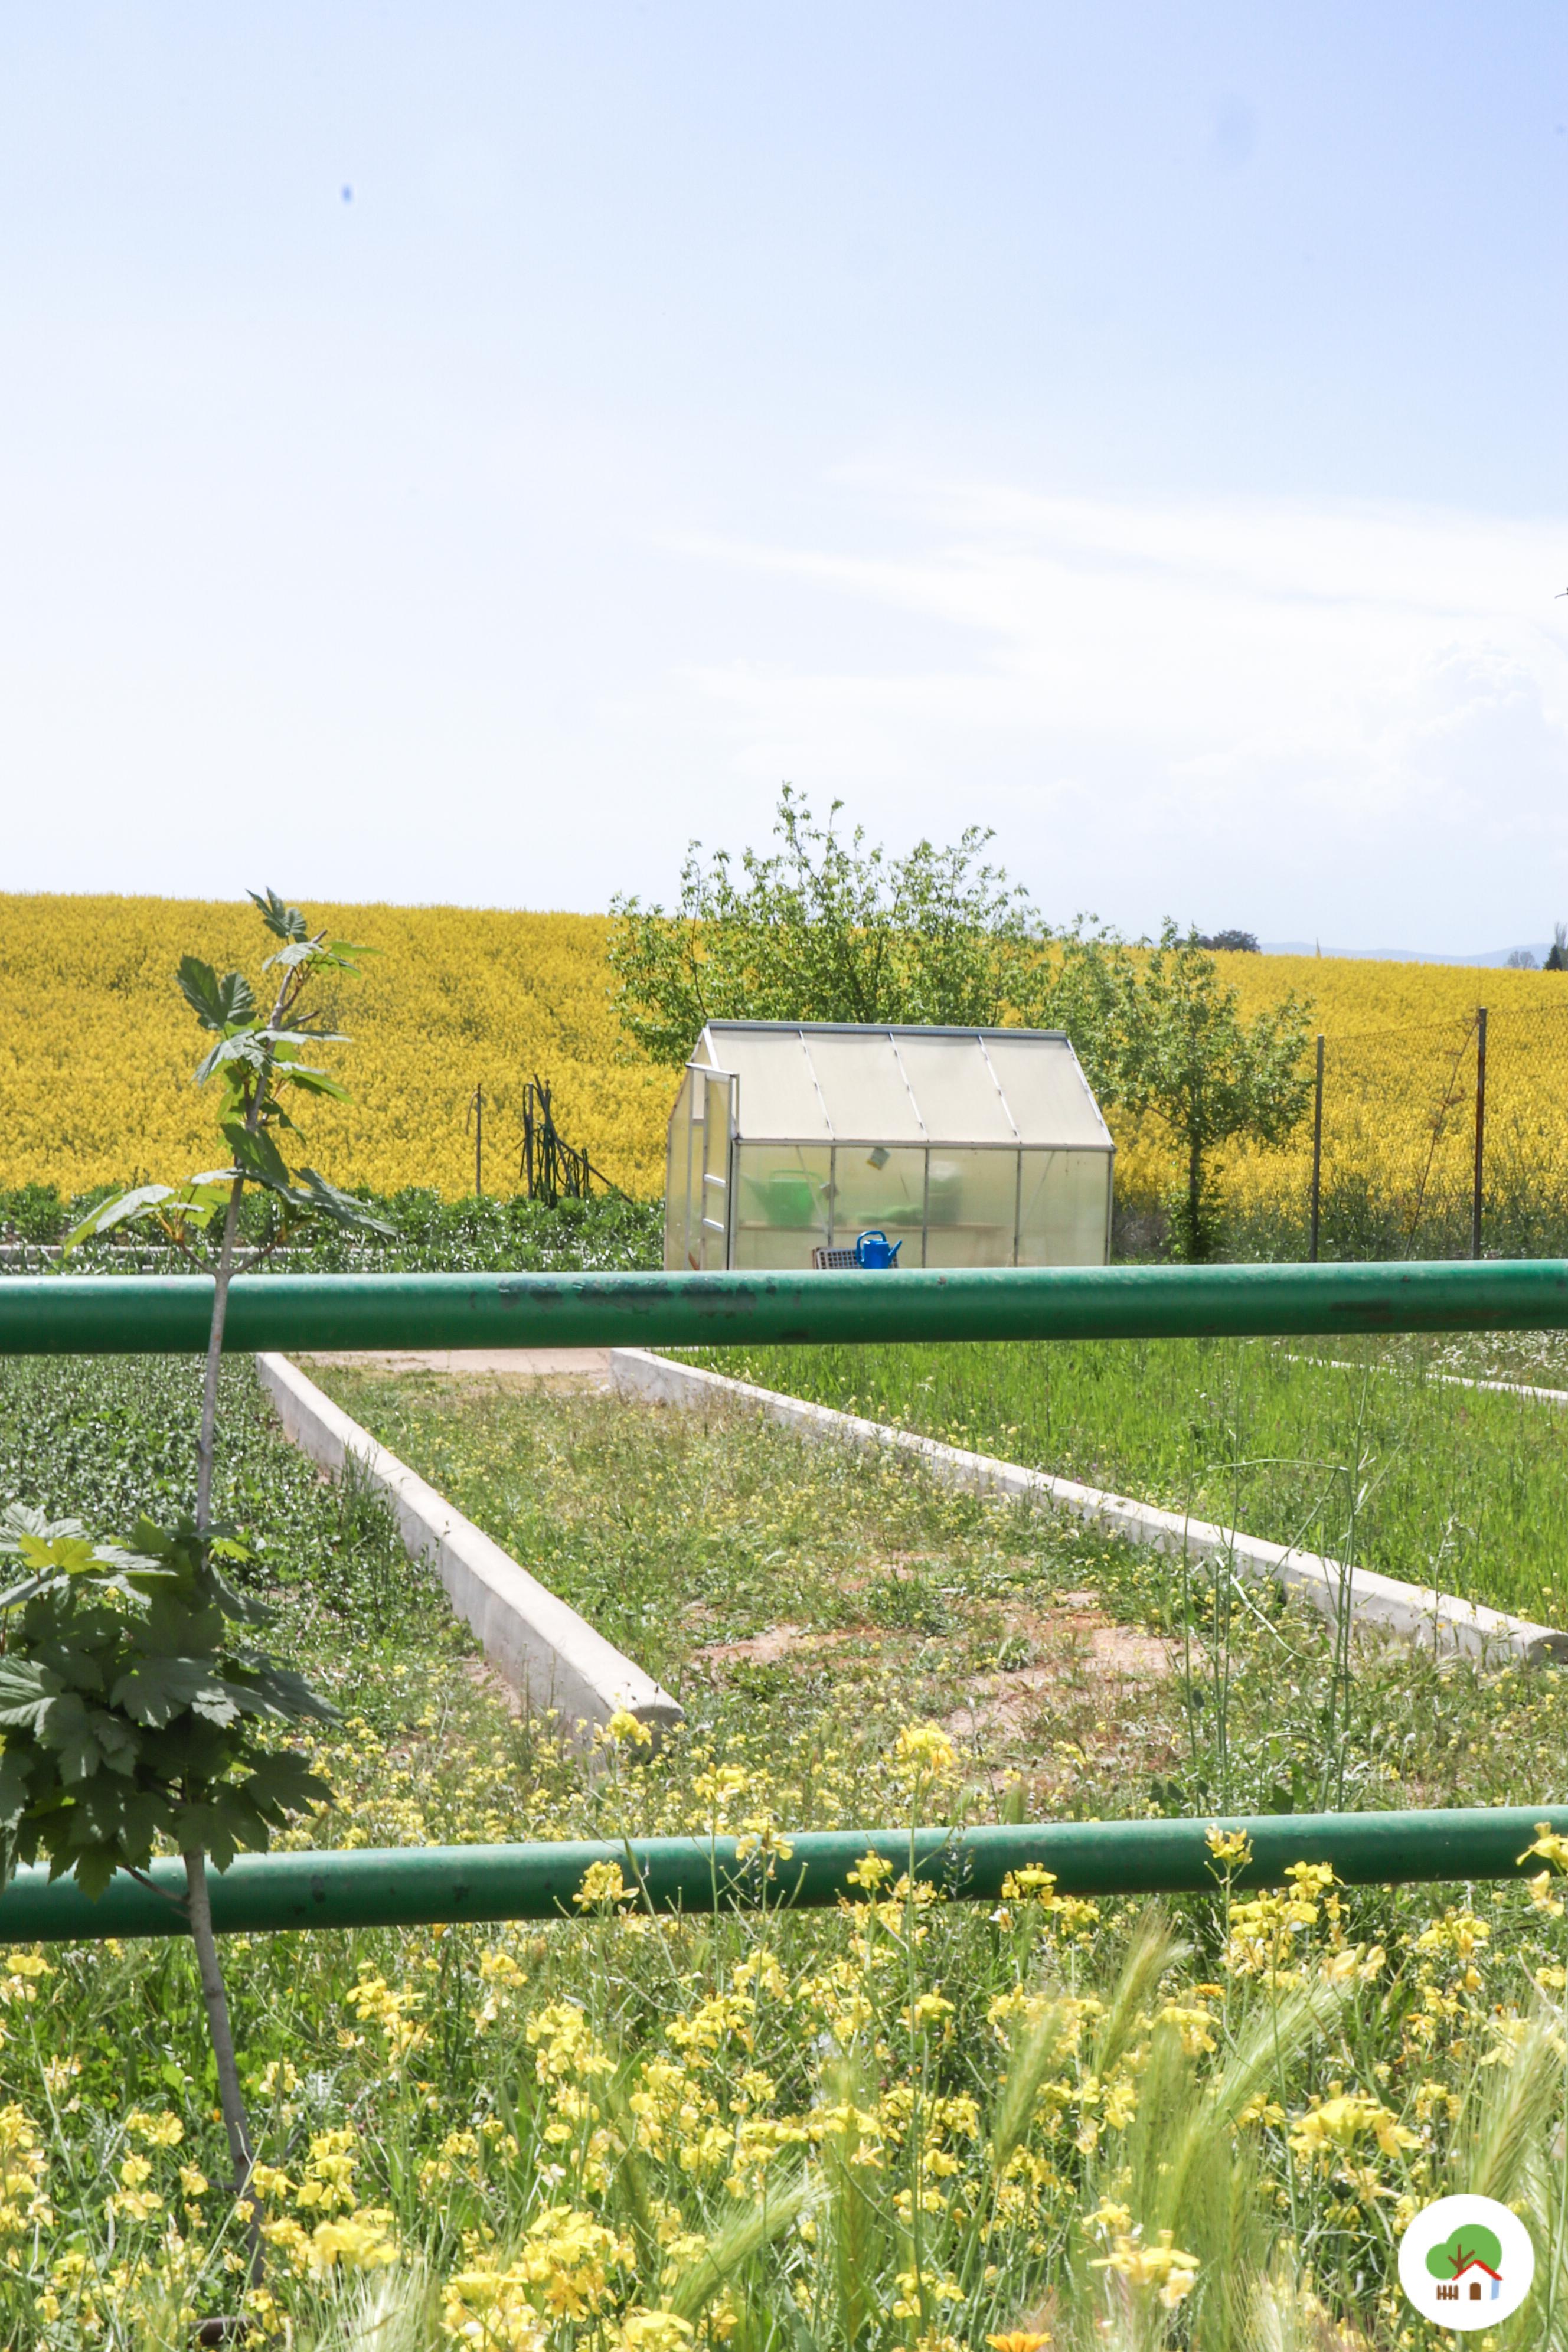 Invernadero en el huerto, Albitana